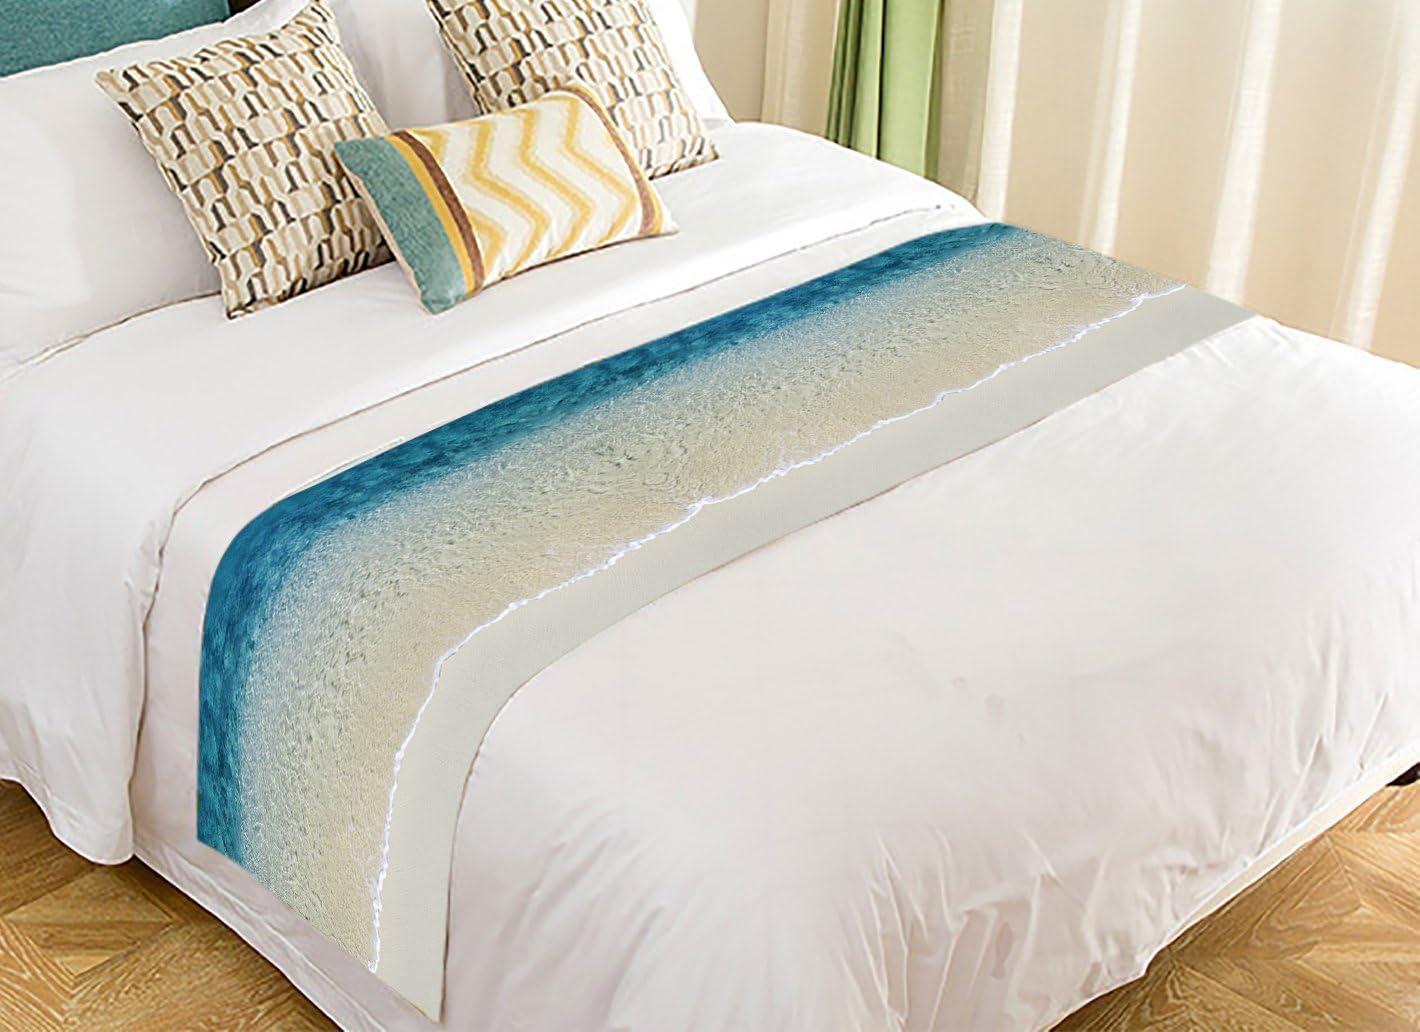 C-Bedcloth Custom Memphis Mall Beach Clear Sea Super Bed 67% OFF of fixed price Decoratio Ocean Sand